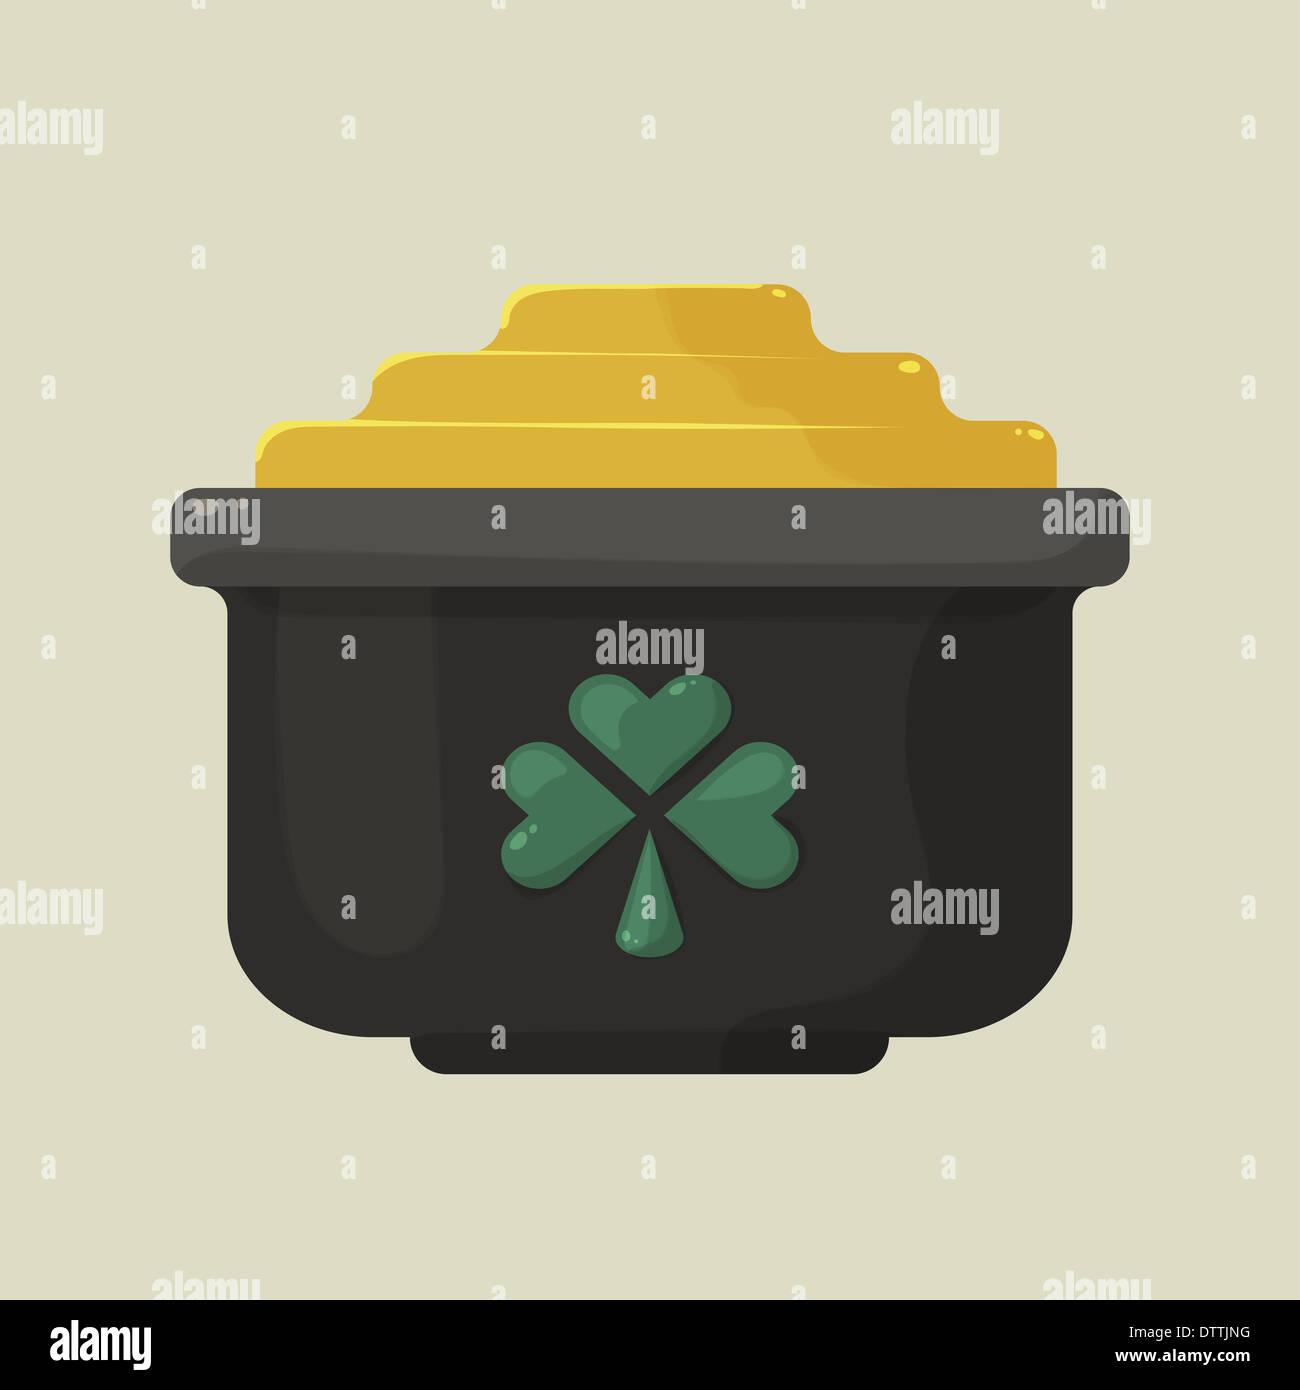 Stilisierte glänzenden Cartoon Topf voll Gold mit einem grünen Kleeblatt Stockbild